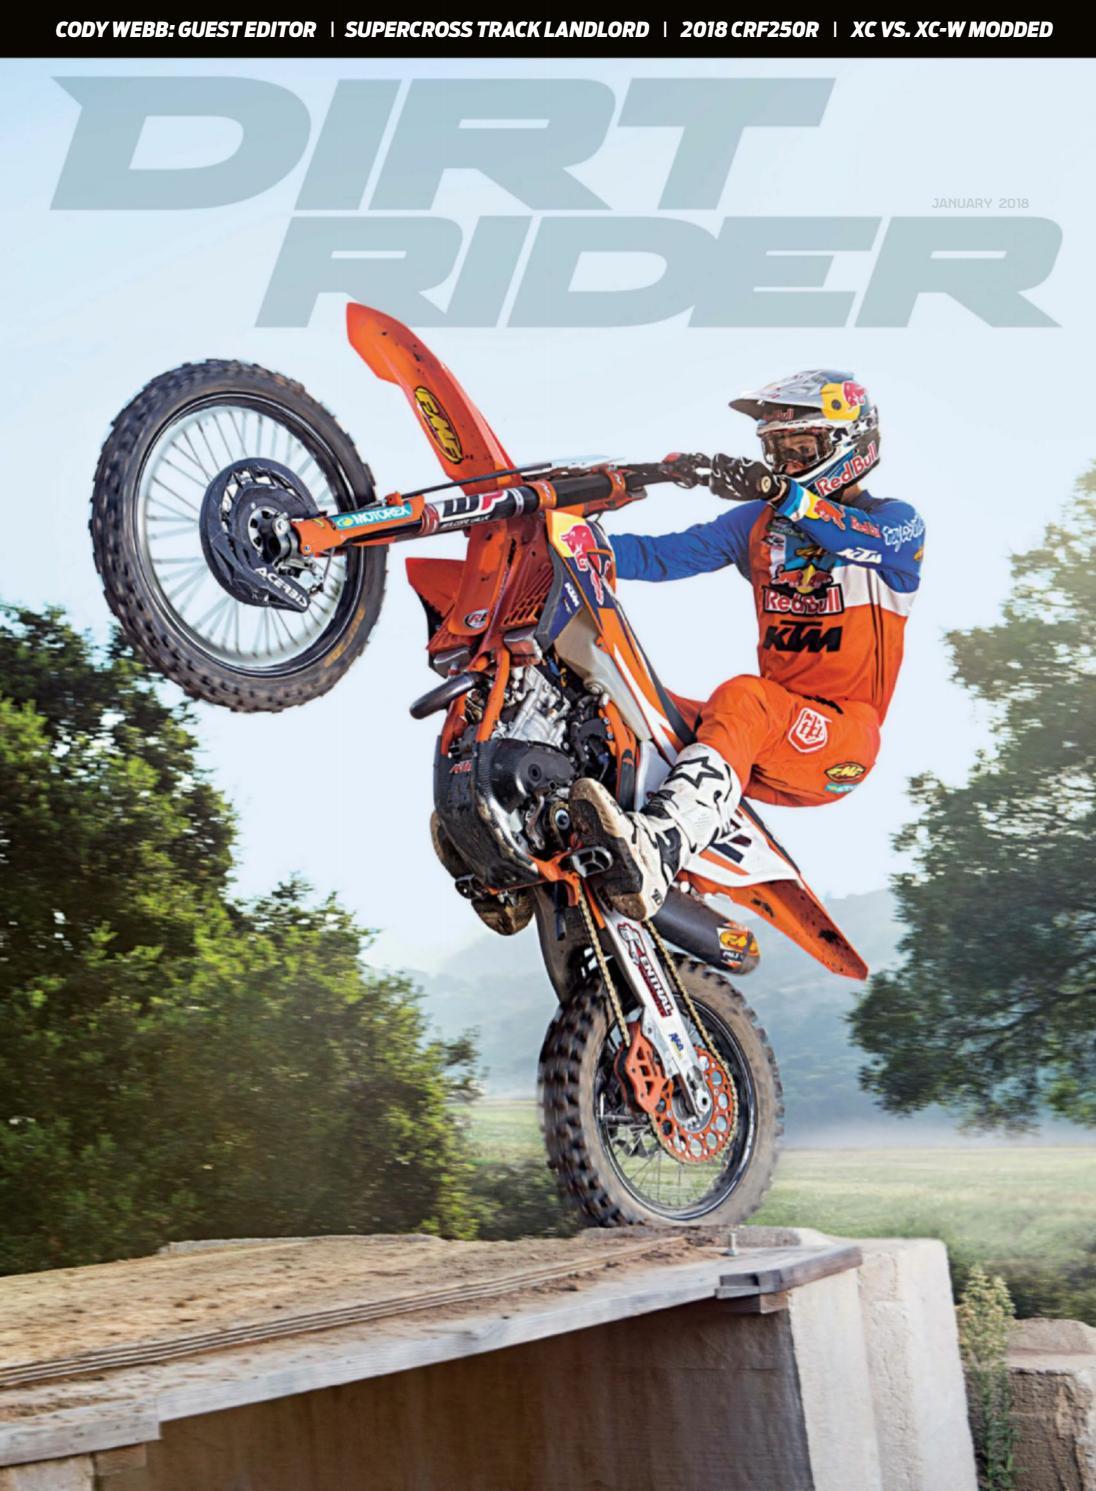 Motocross MX Dirtbike Enduro Trials Tyre Bead Buddy Equipment Tools